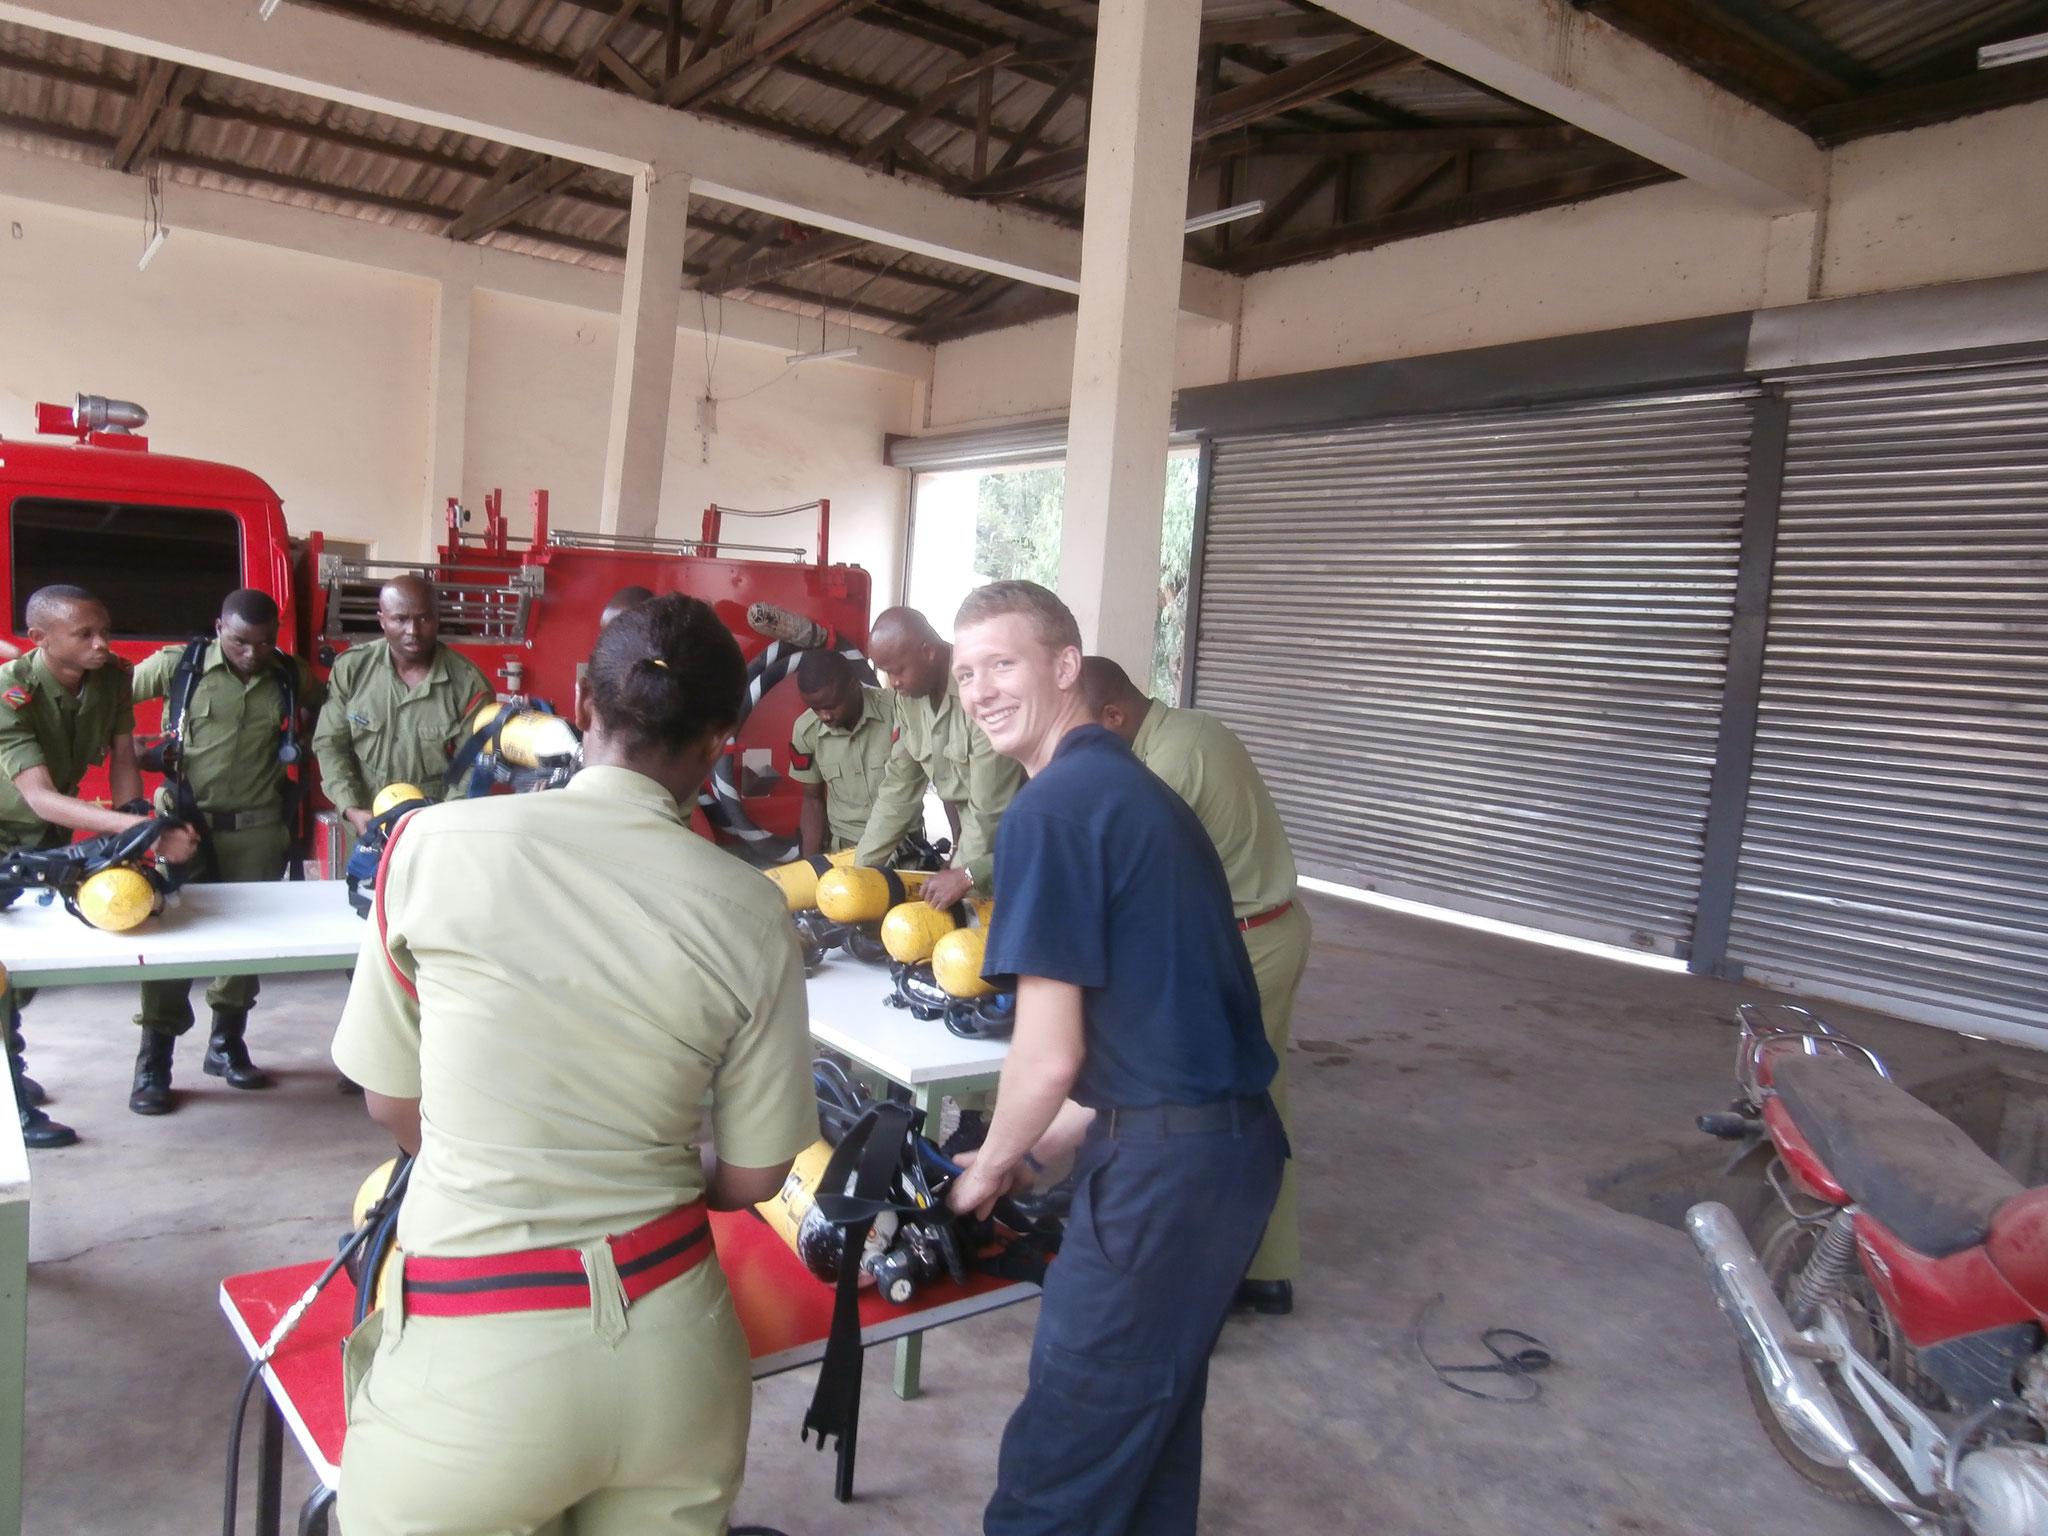 Atemschutztraining in Arusha